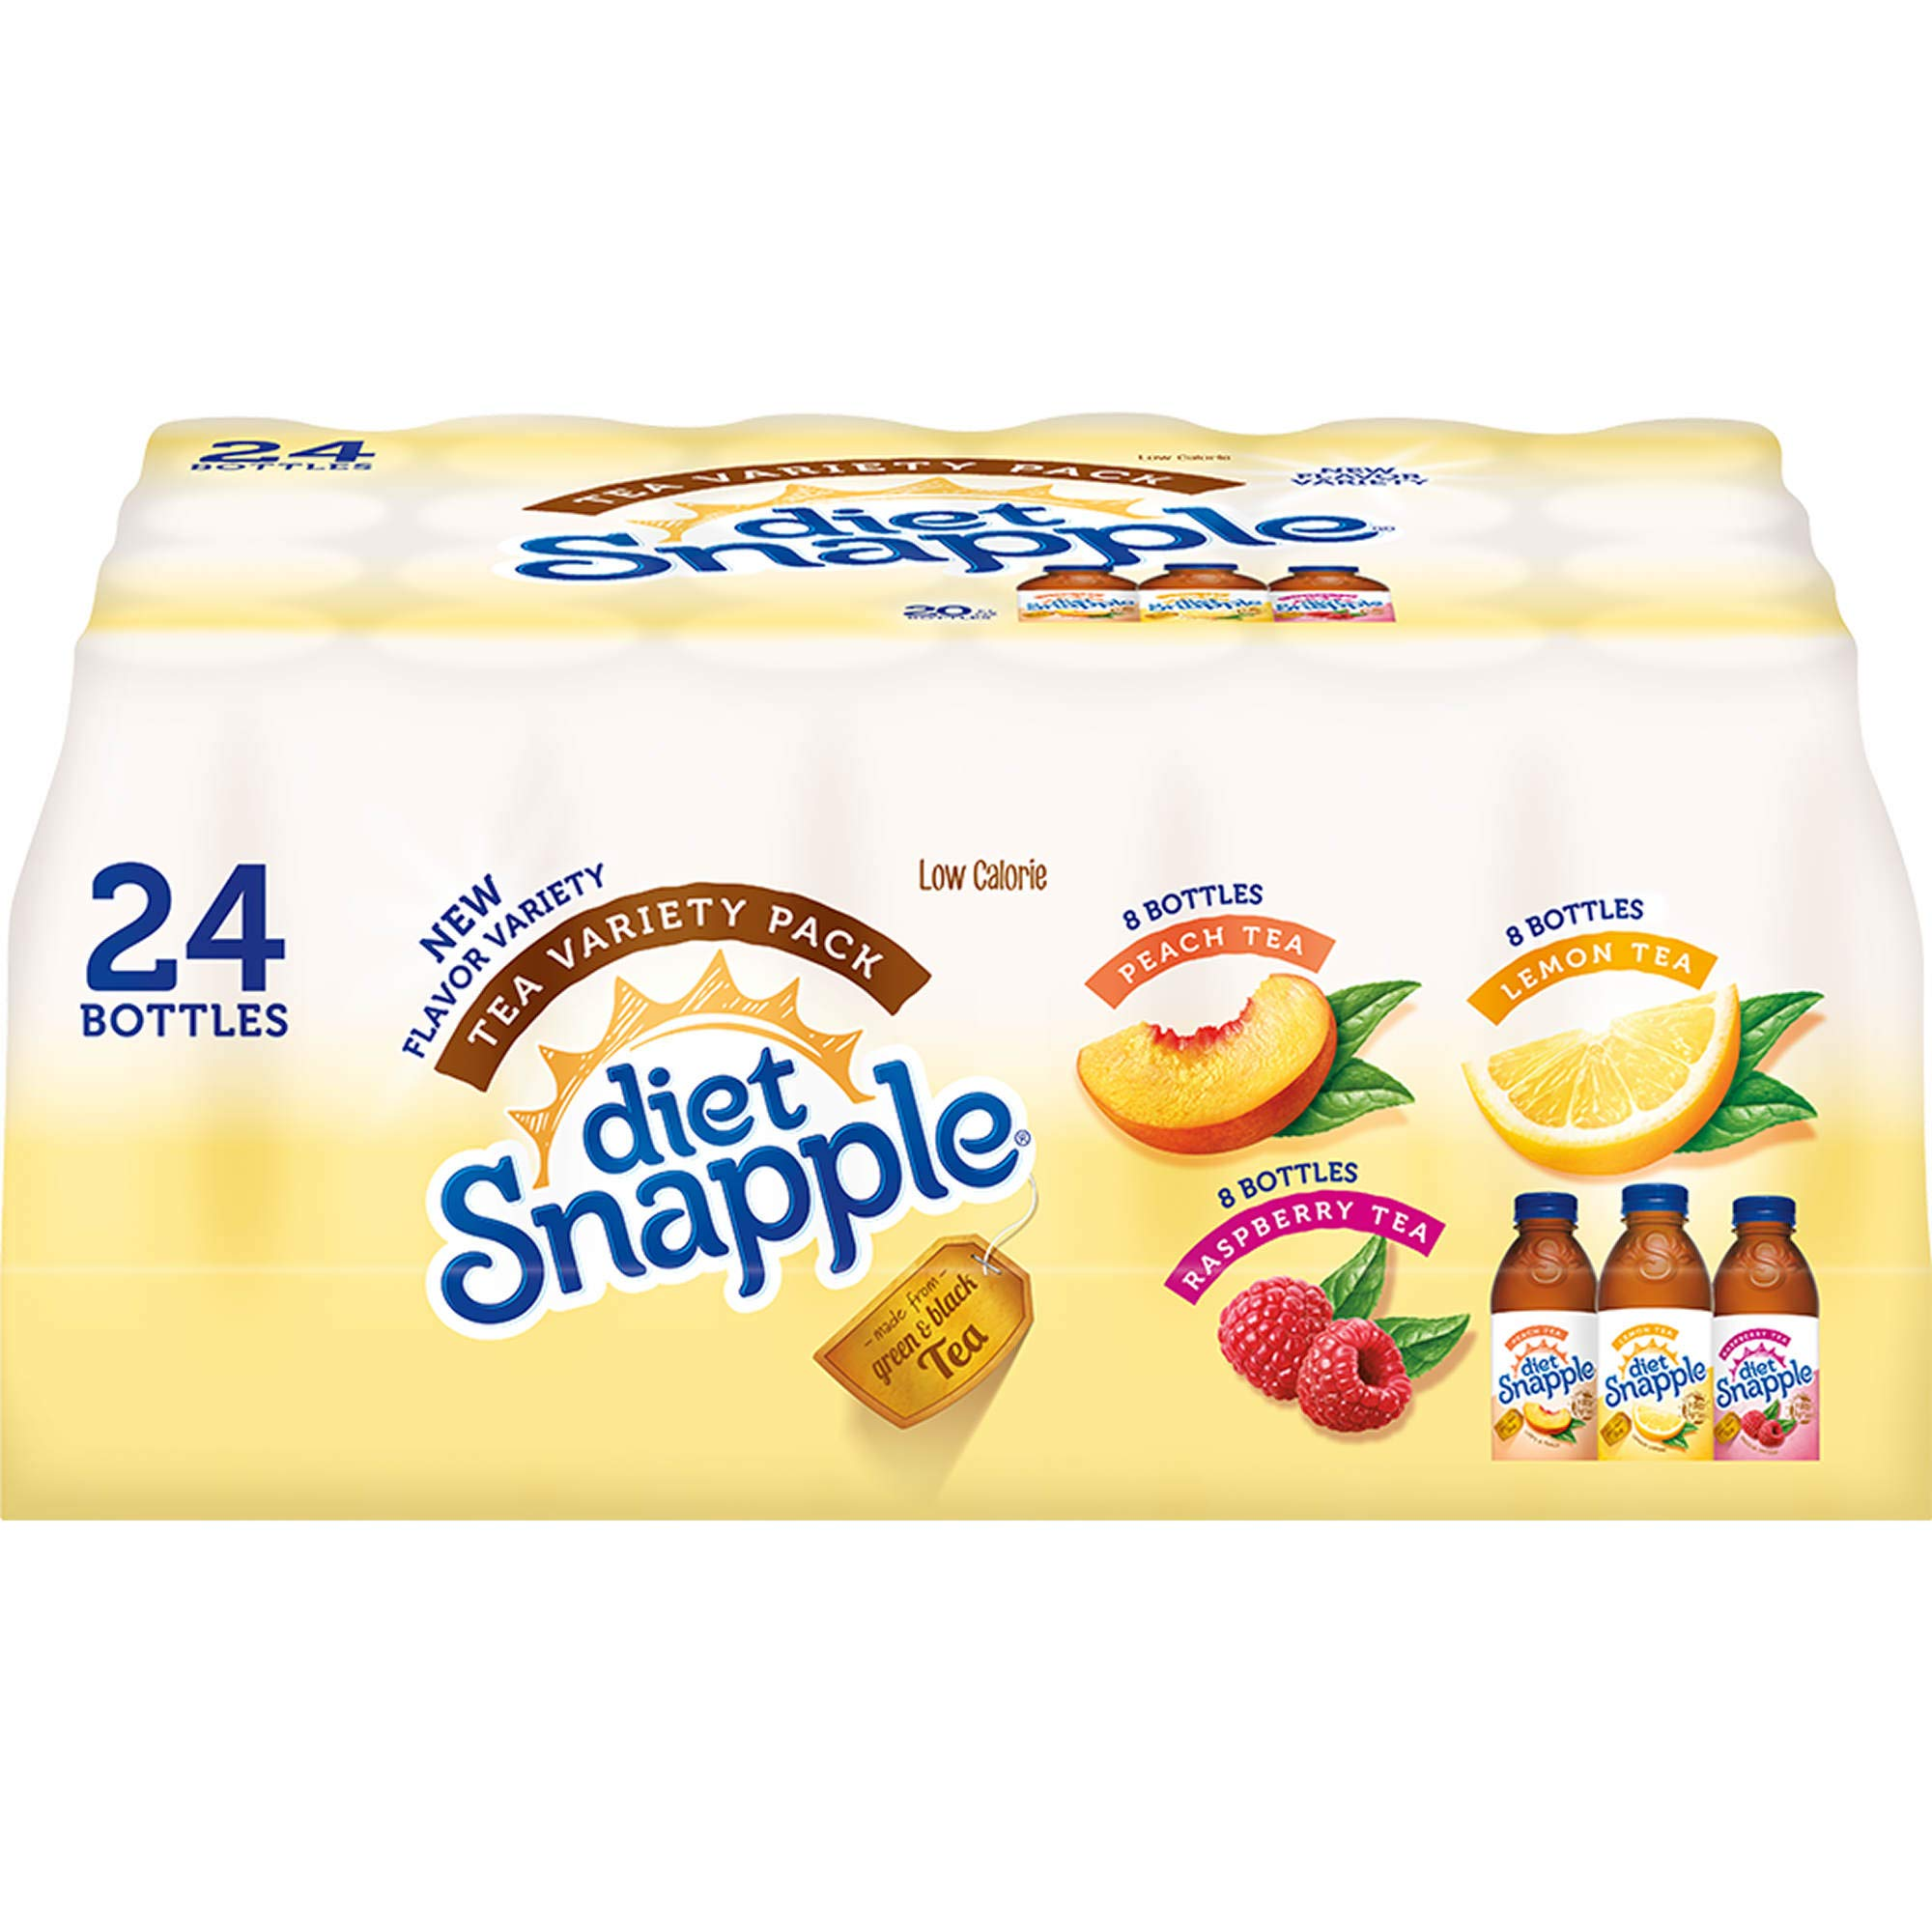 Diet Snapple Ice Tea Variety Pack, 24 pk./20 fl. oz. - 2 PACKS by Snapple (Image #1)